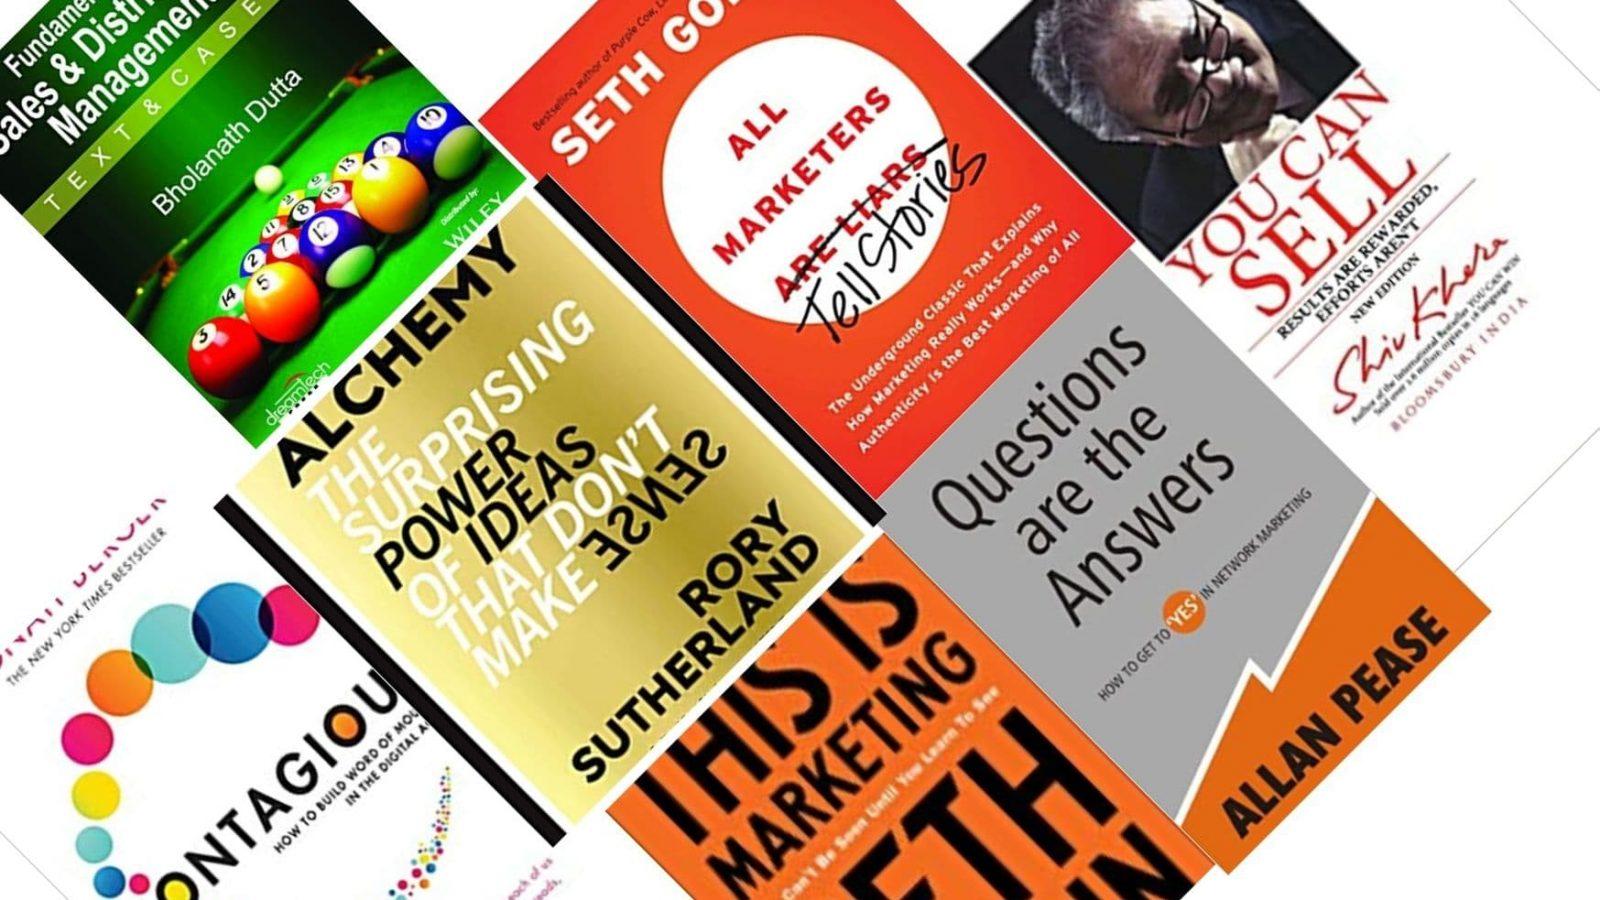 7 best Sales Motivational books for Indian Sales Professionals: